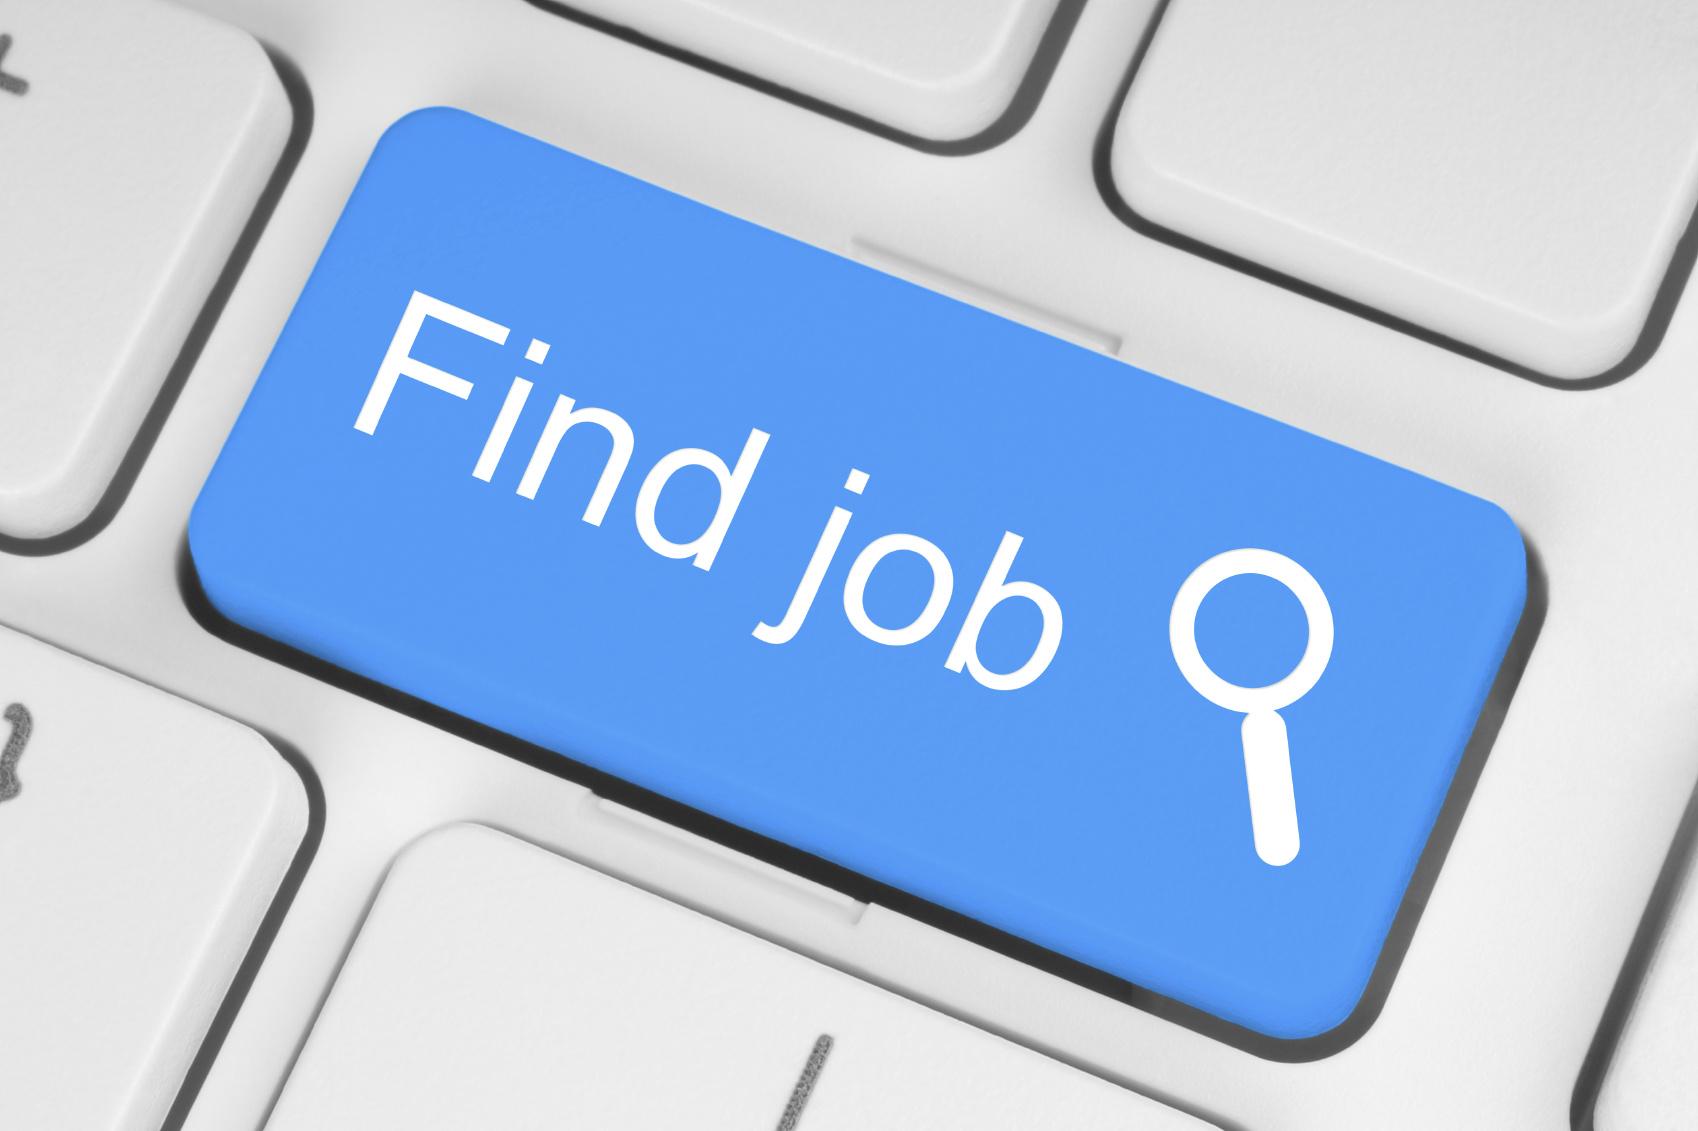 Find Job Computer Button